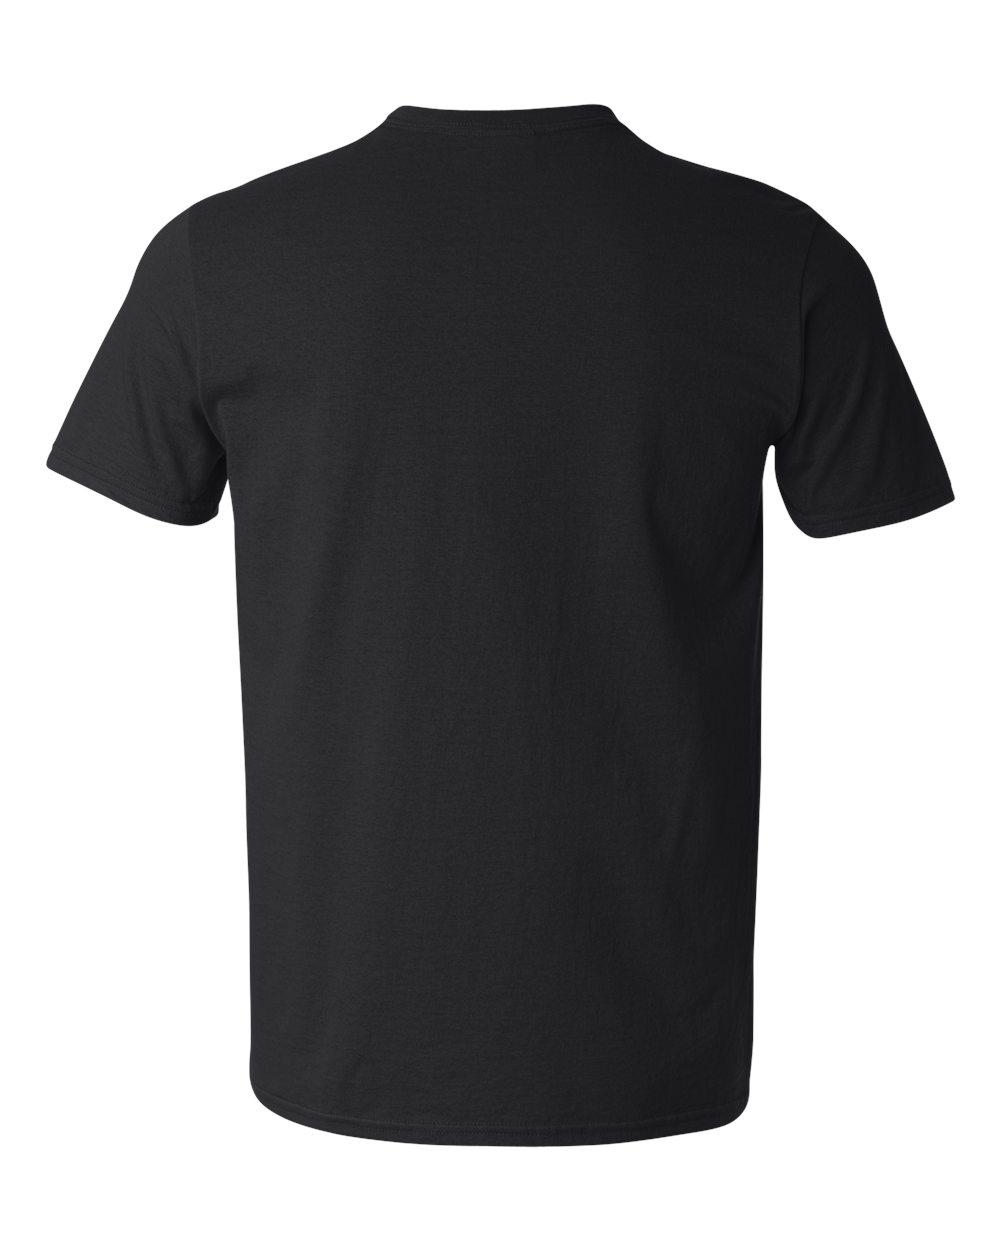 Gildan a shirts kamos t shirt for 100 cotton v neck t shirts wholesale